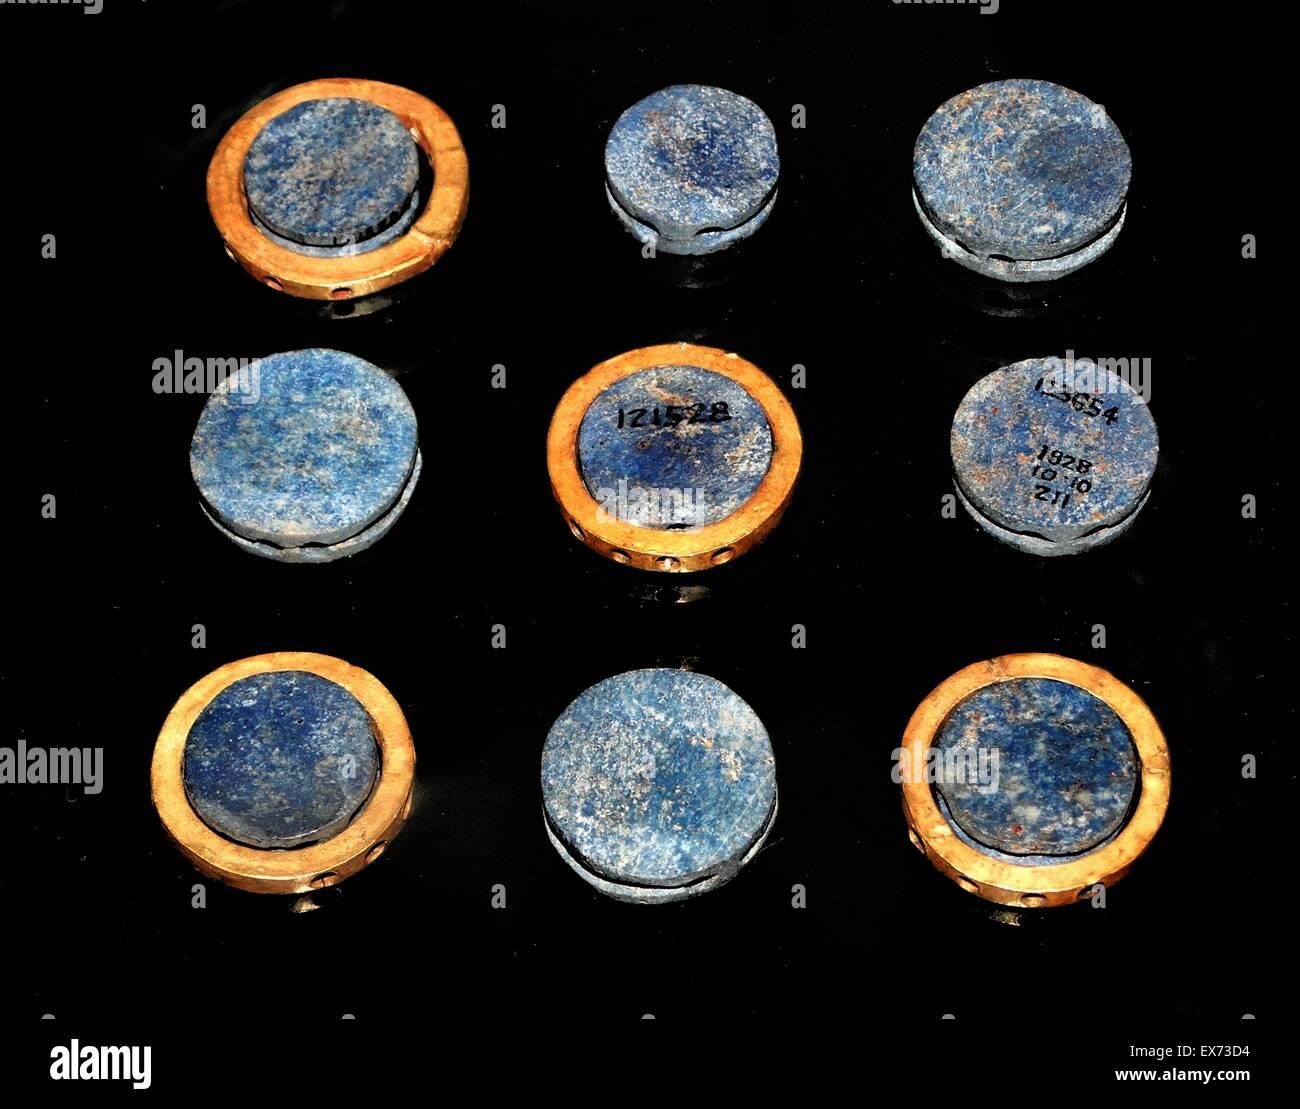 Early Mesopotamian Lapis Lazuli and gold discs used for decoration, Iraq, circa 2900-2300 BC Akkadian - Stock Image